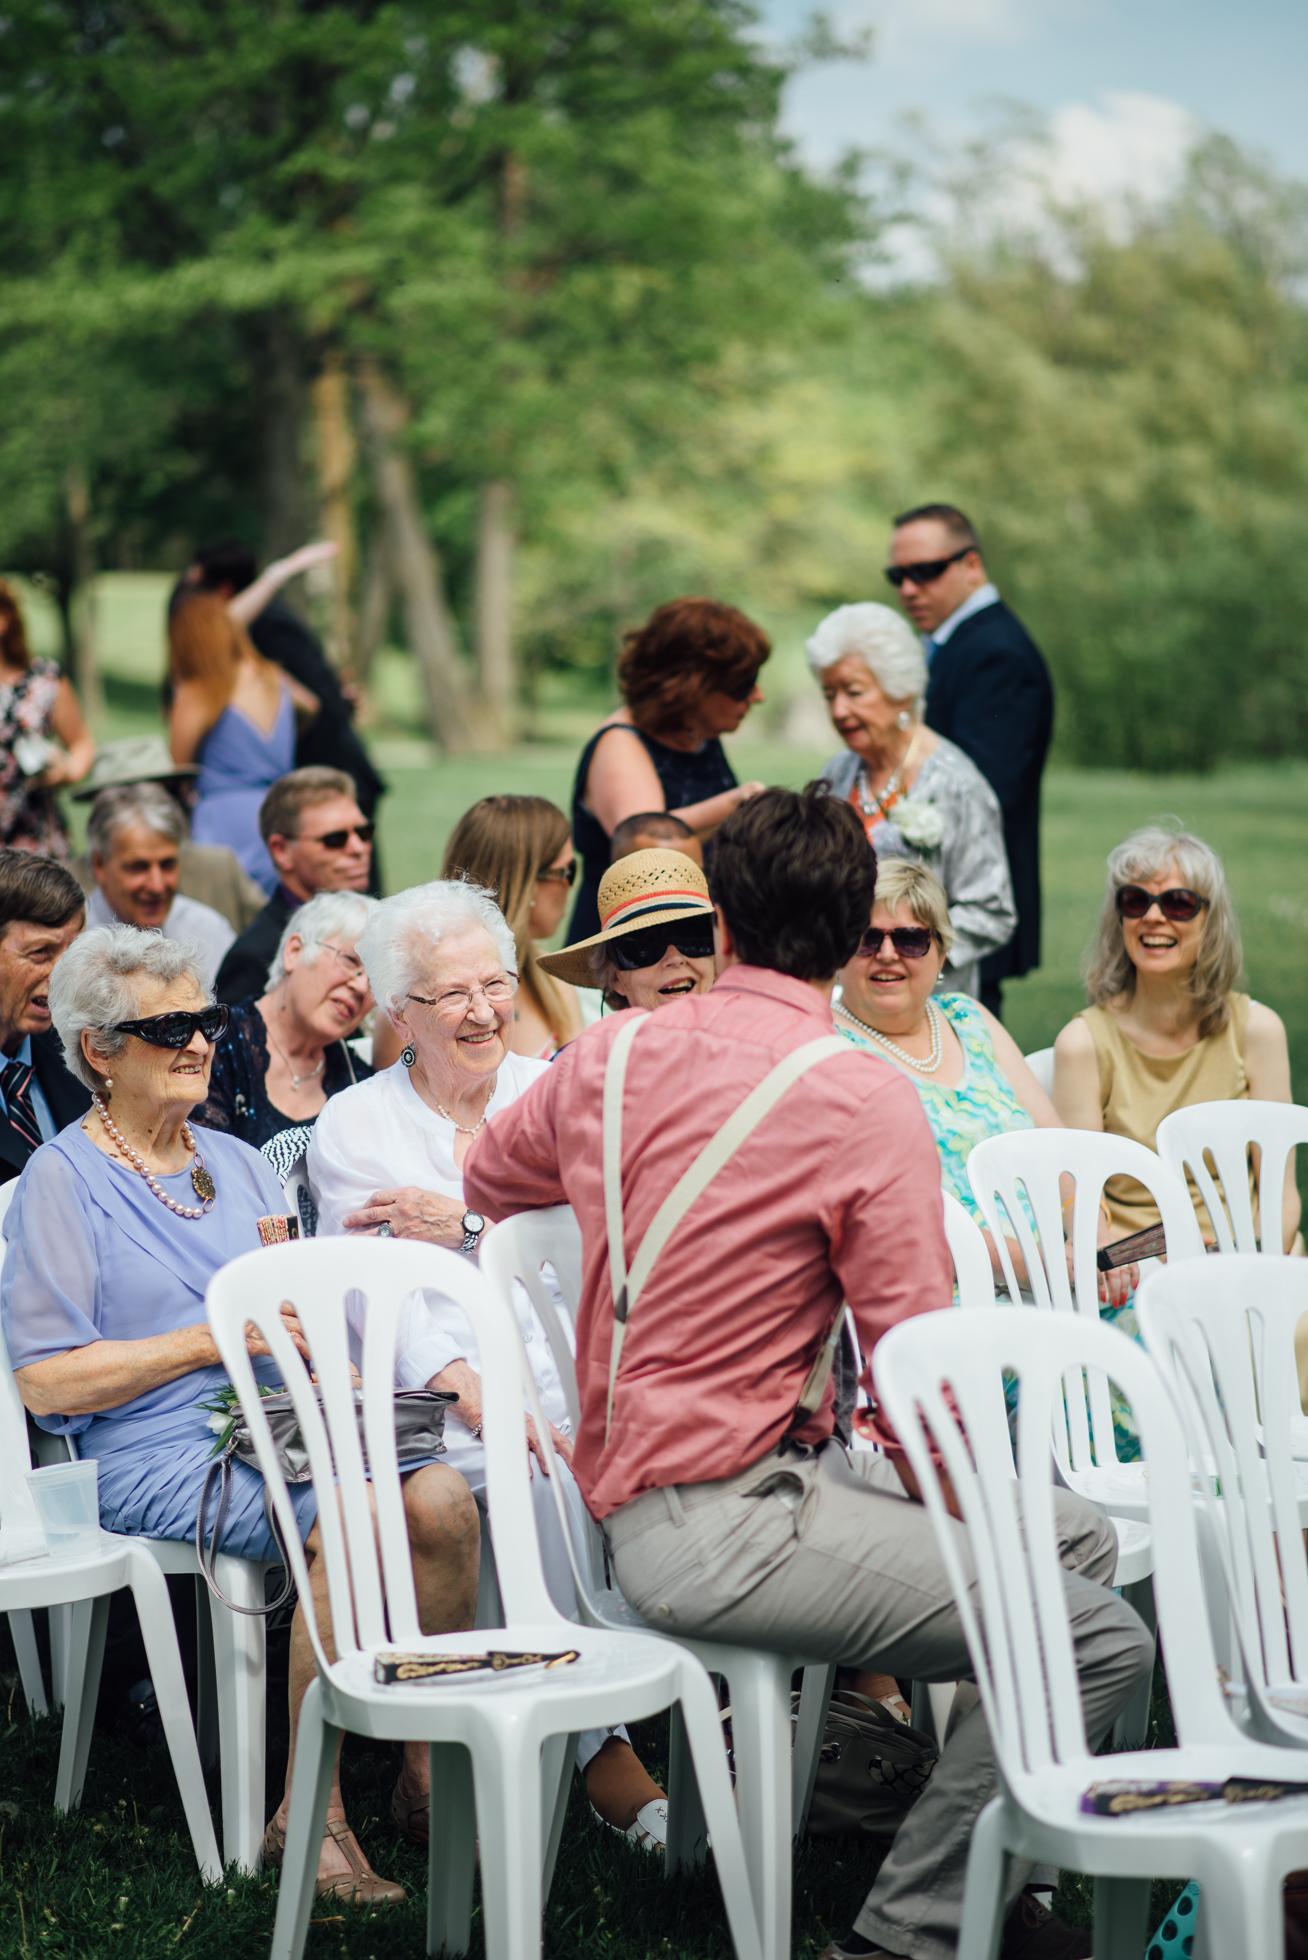 Outdoor-Caledon-Tralee-Wedding-Photography-46